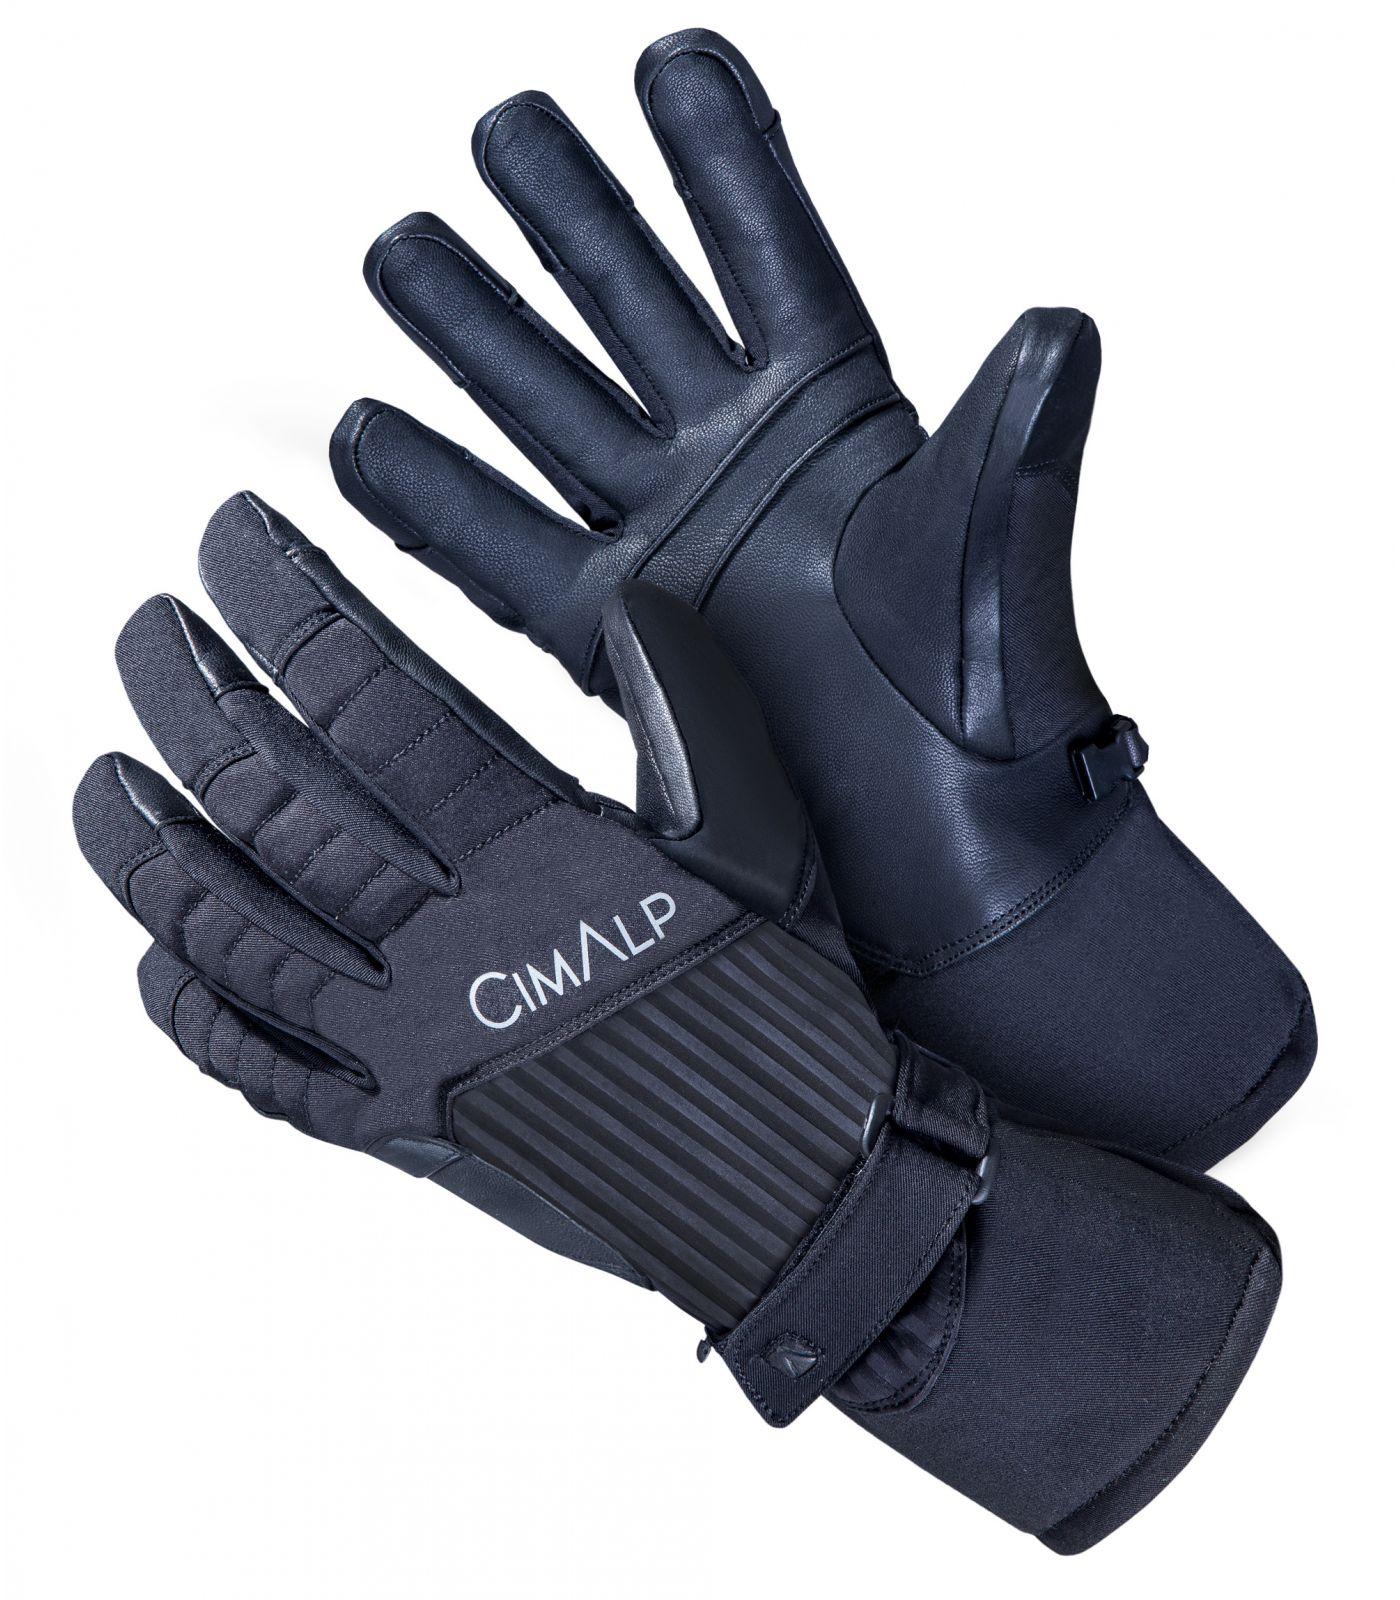 choisir des gants de ski